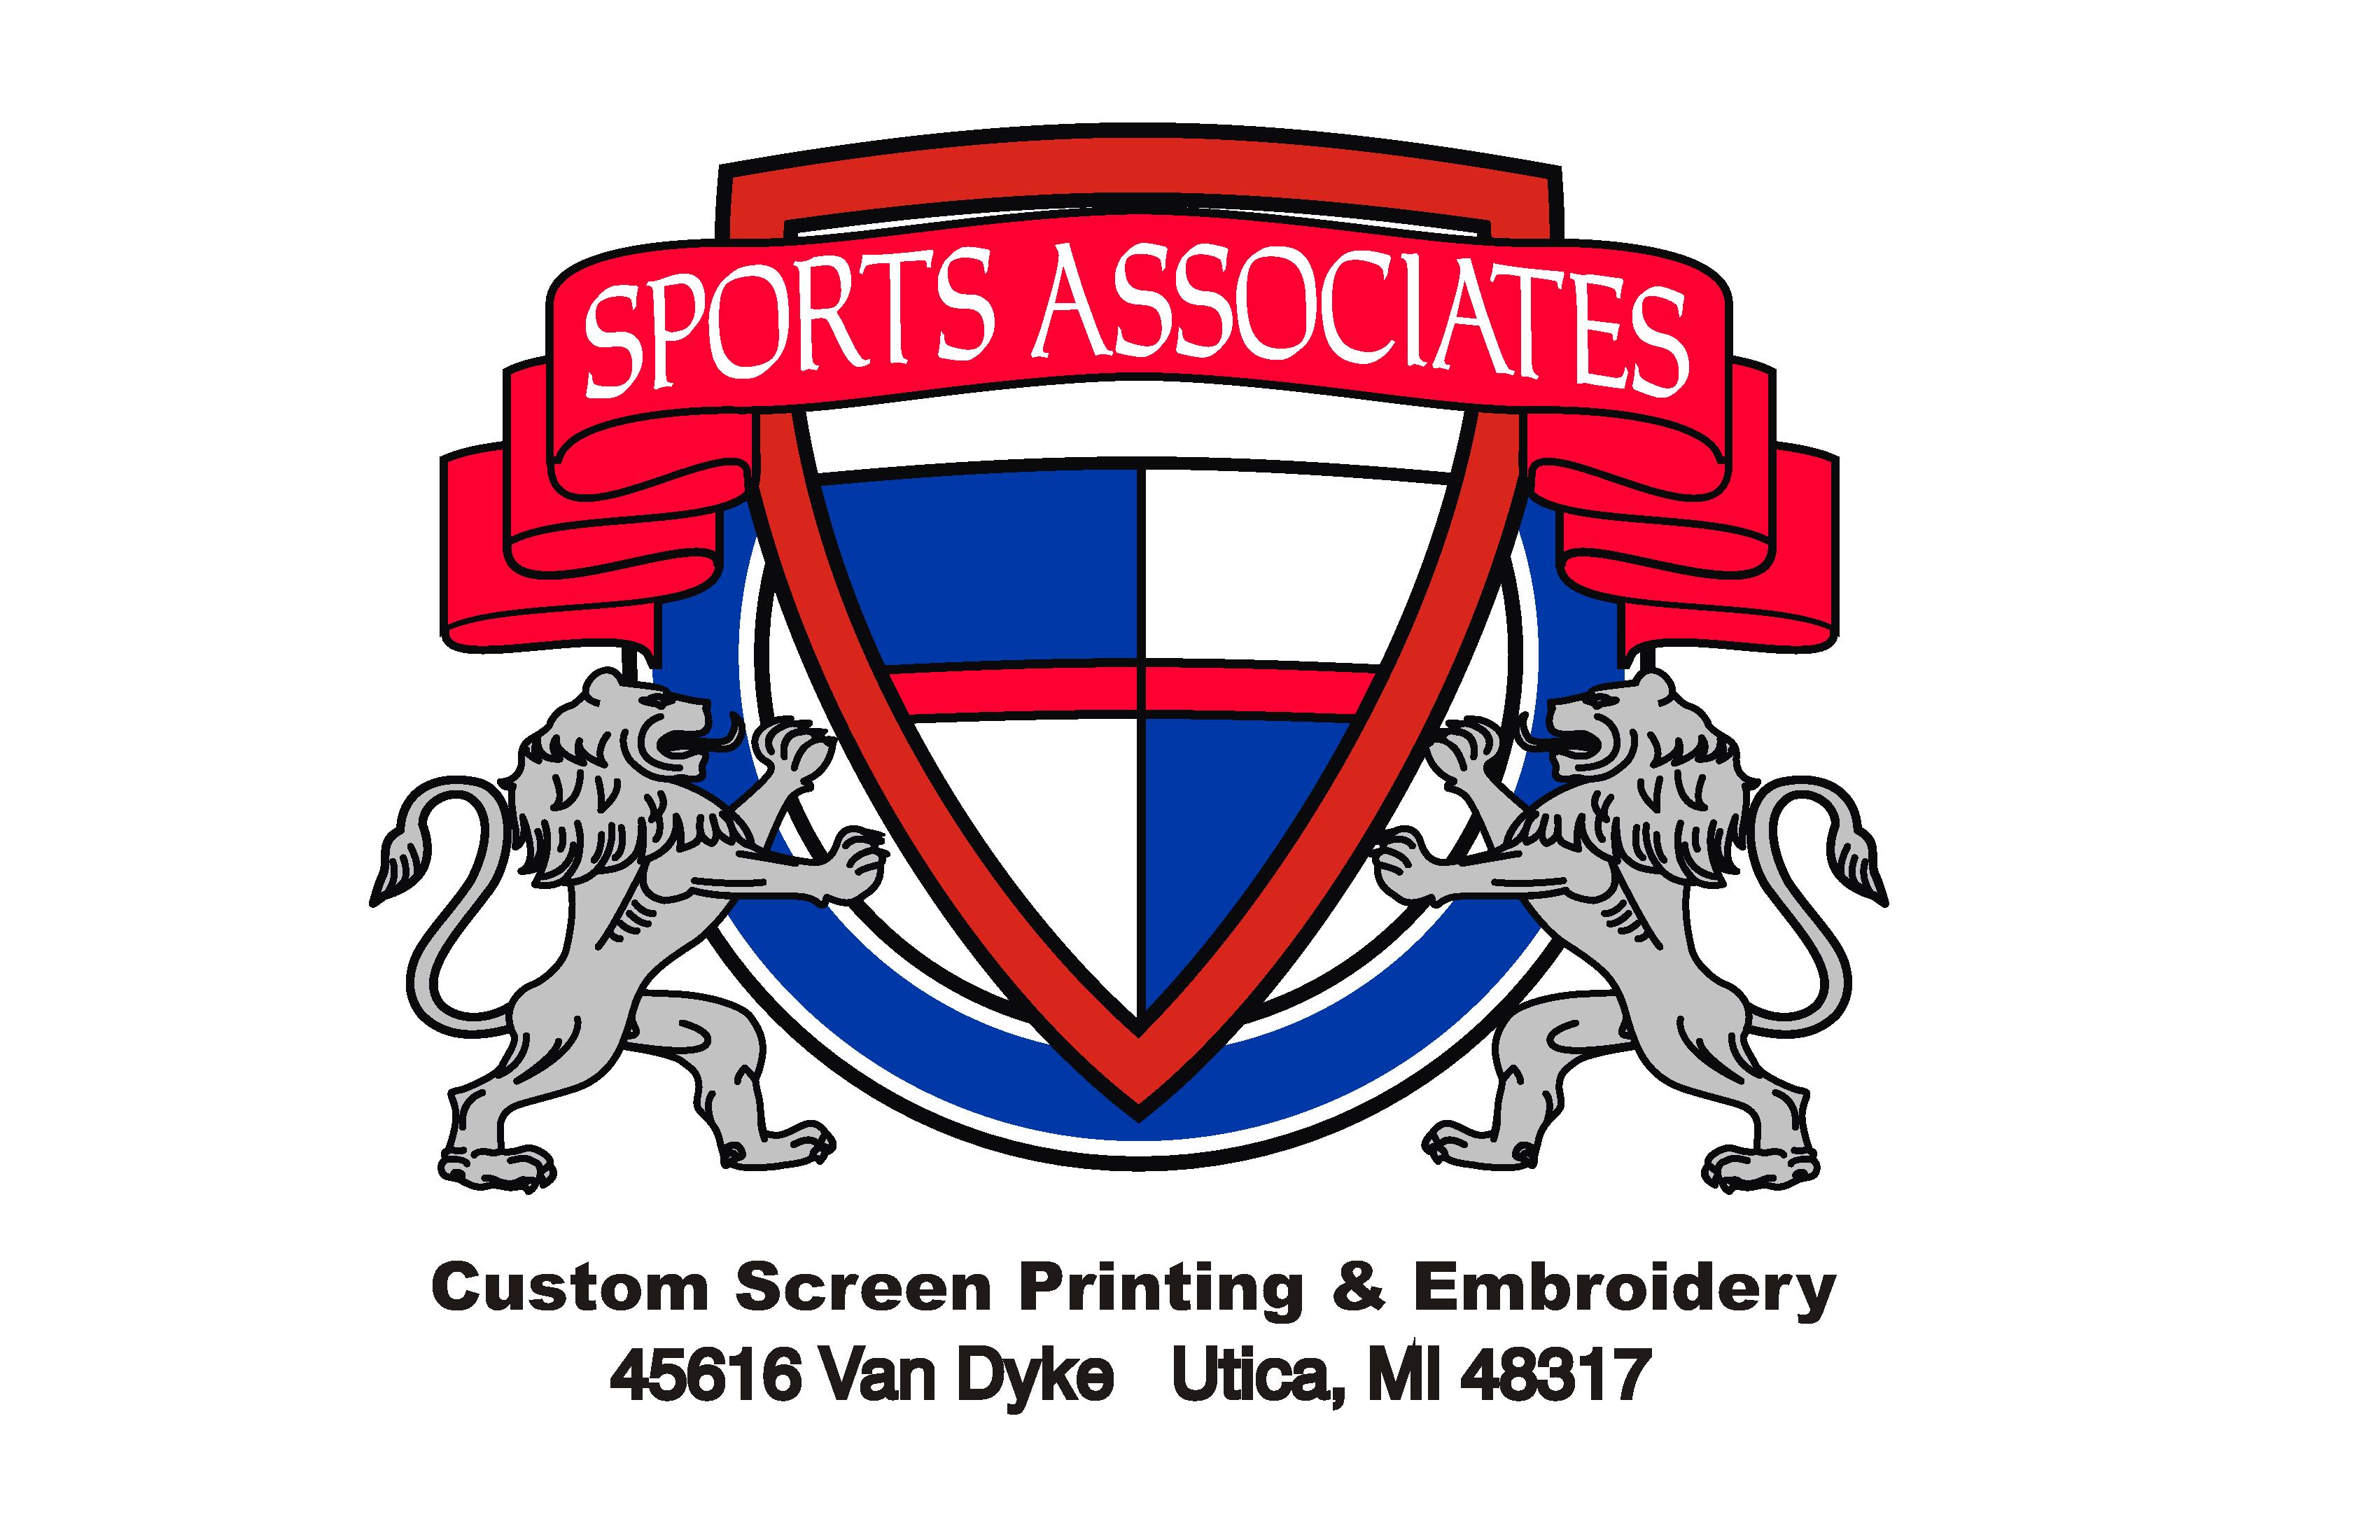 Sports Associates